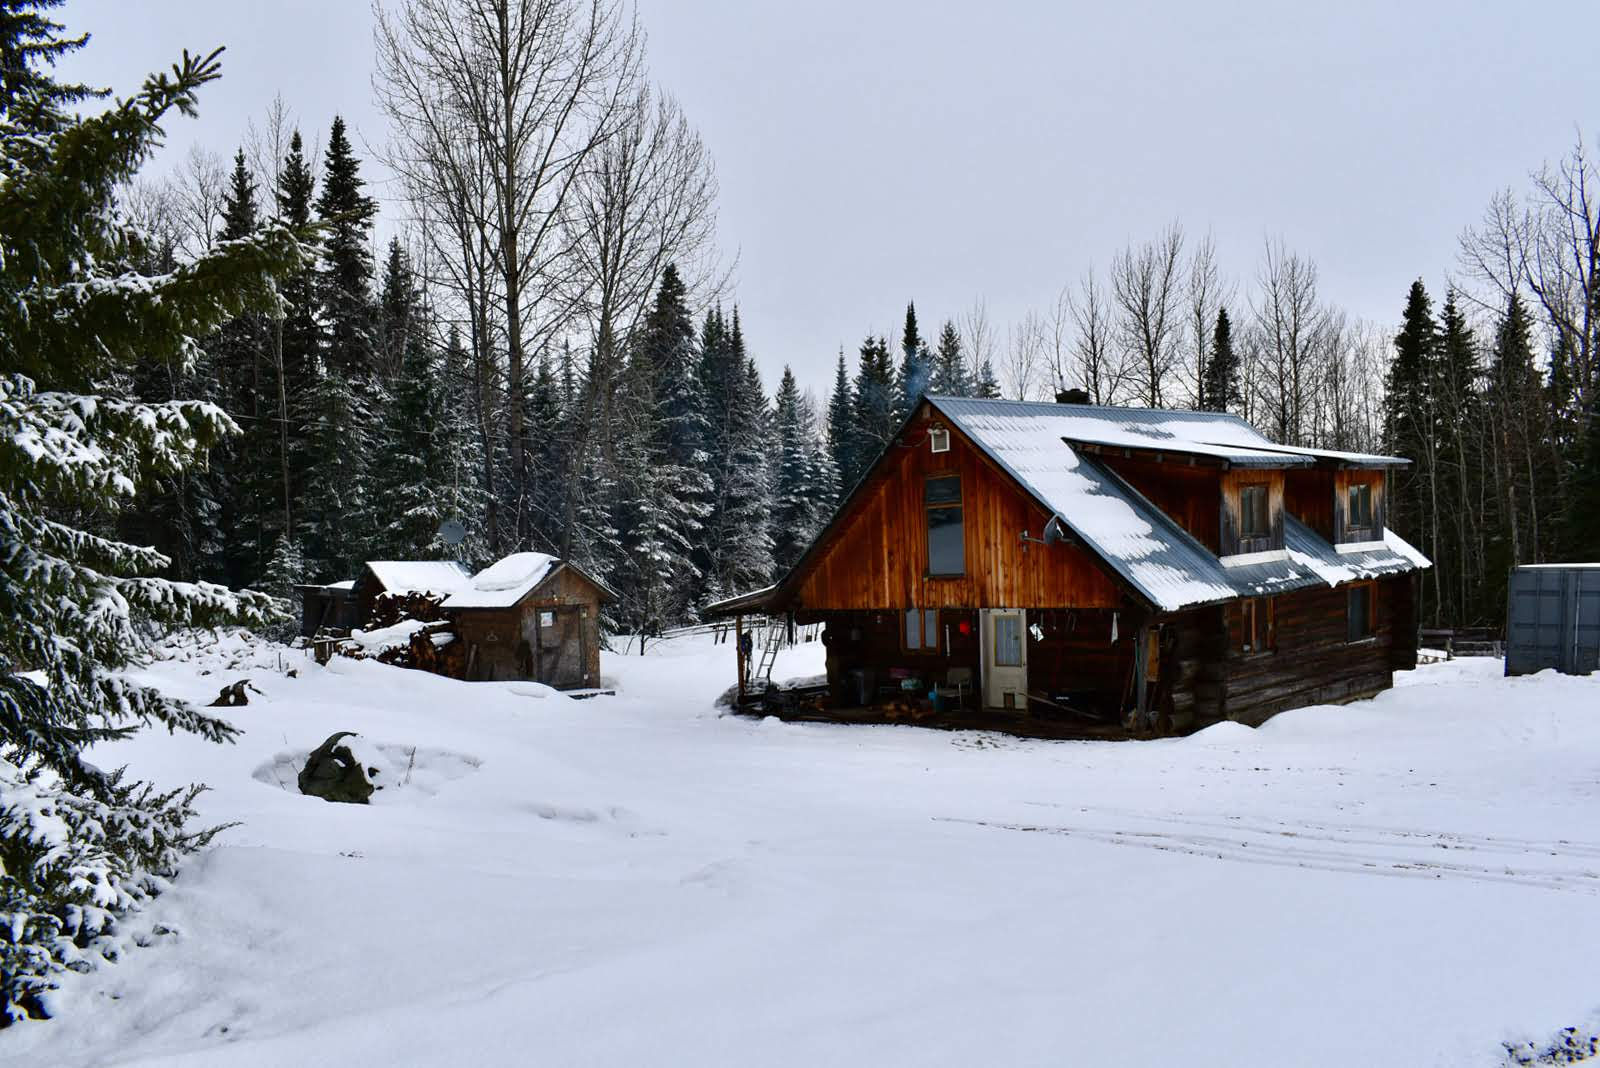 Quesnel-Hixon Road, Quesnel, British Columbia    - Photo 6 - RP3180632378